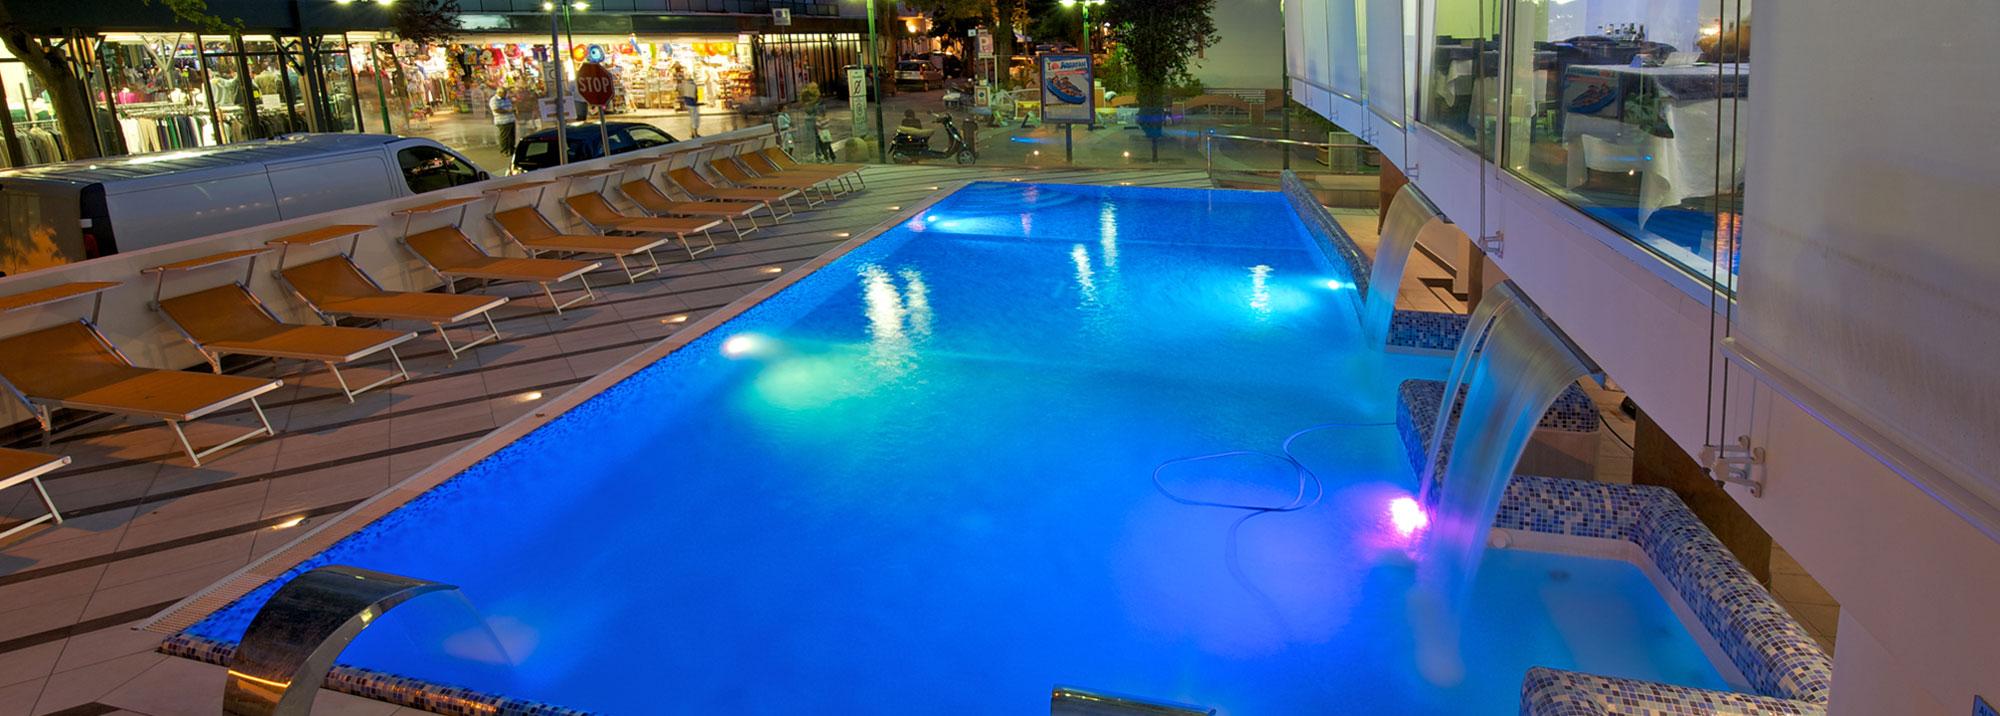 Hotel Spa Cattolica